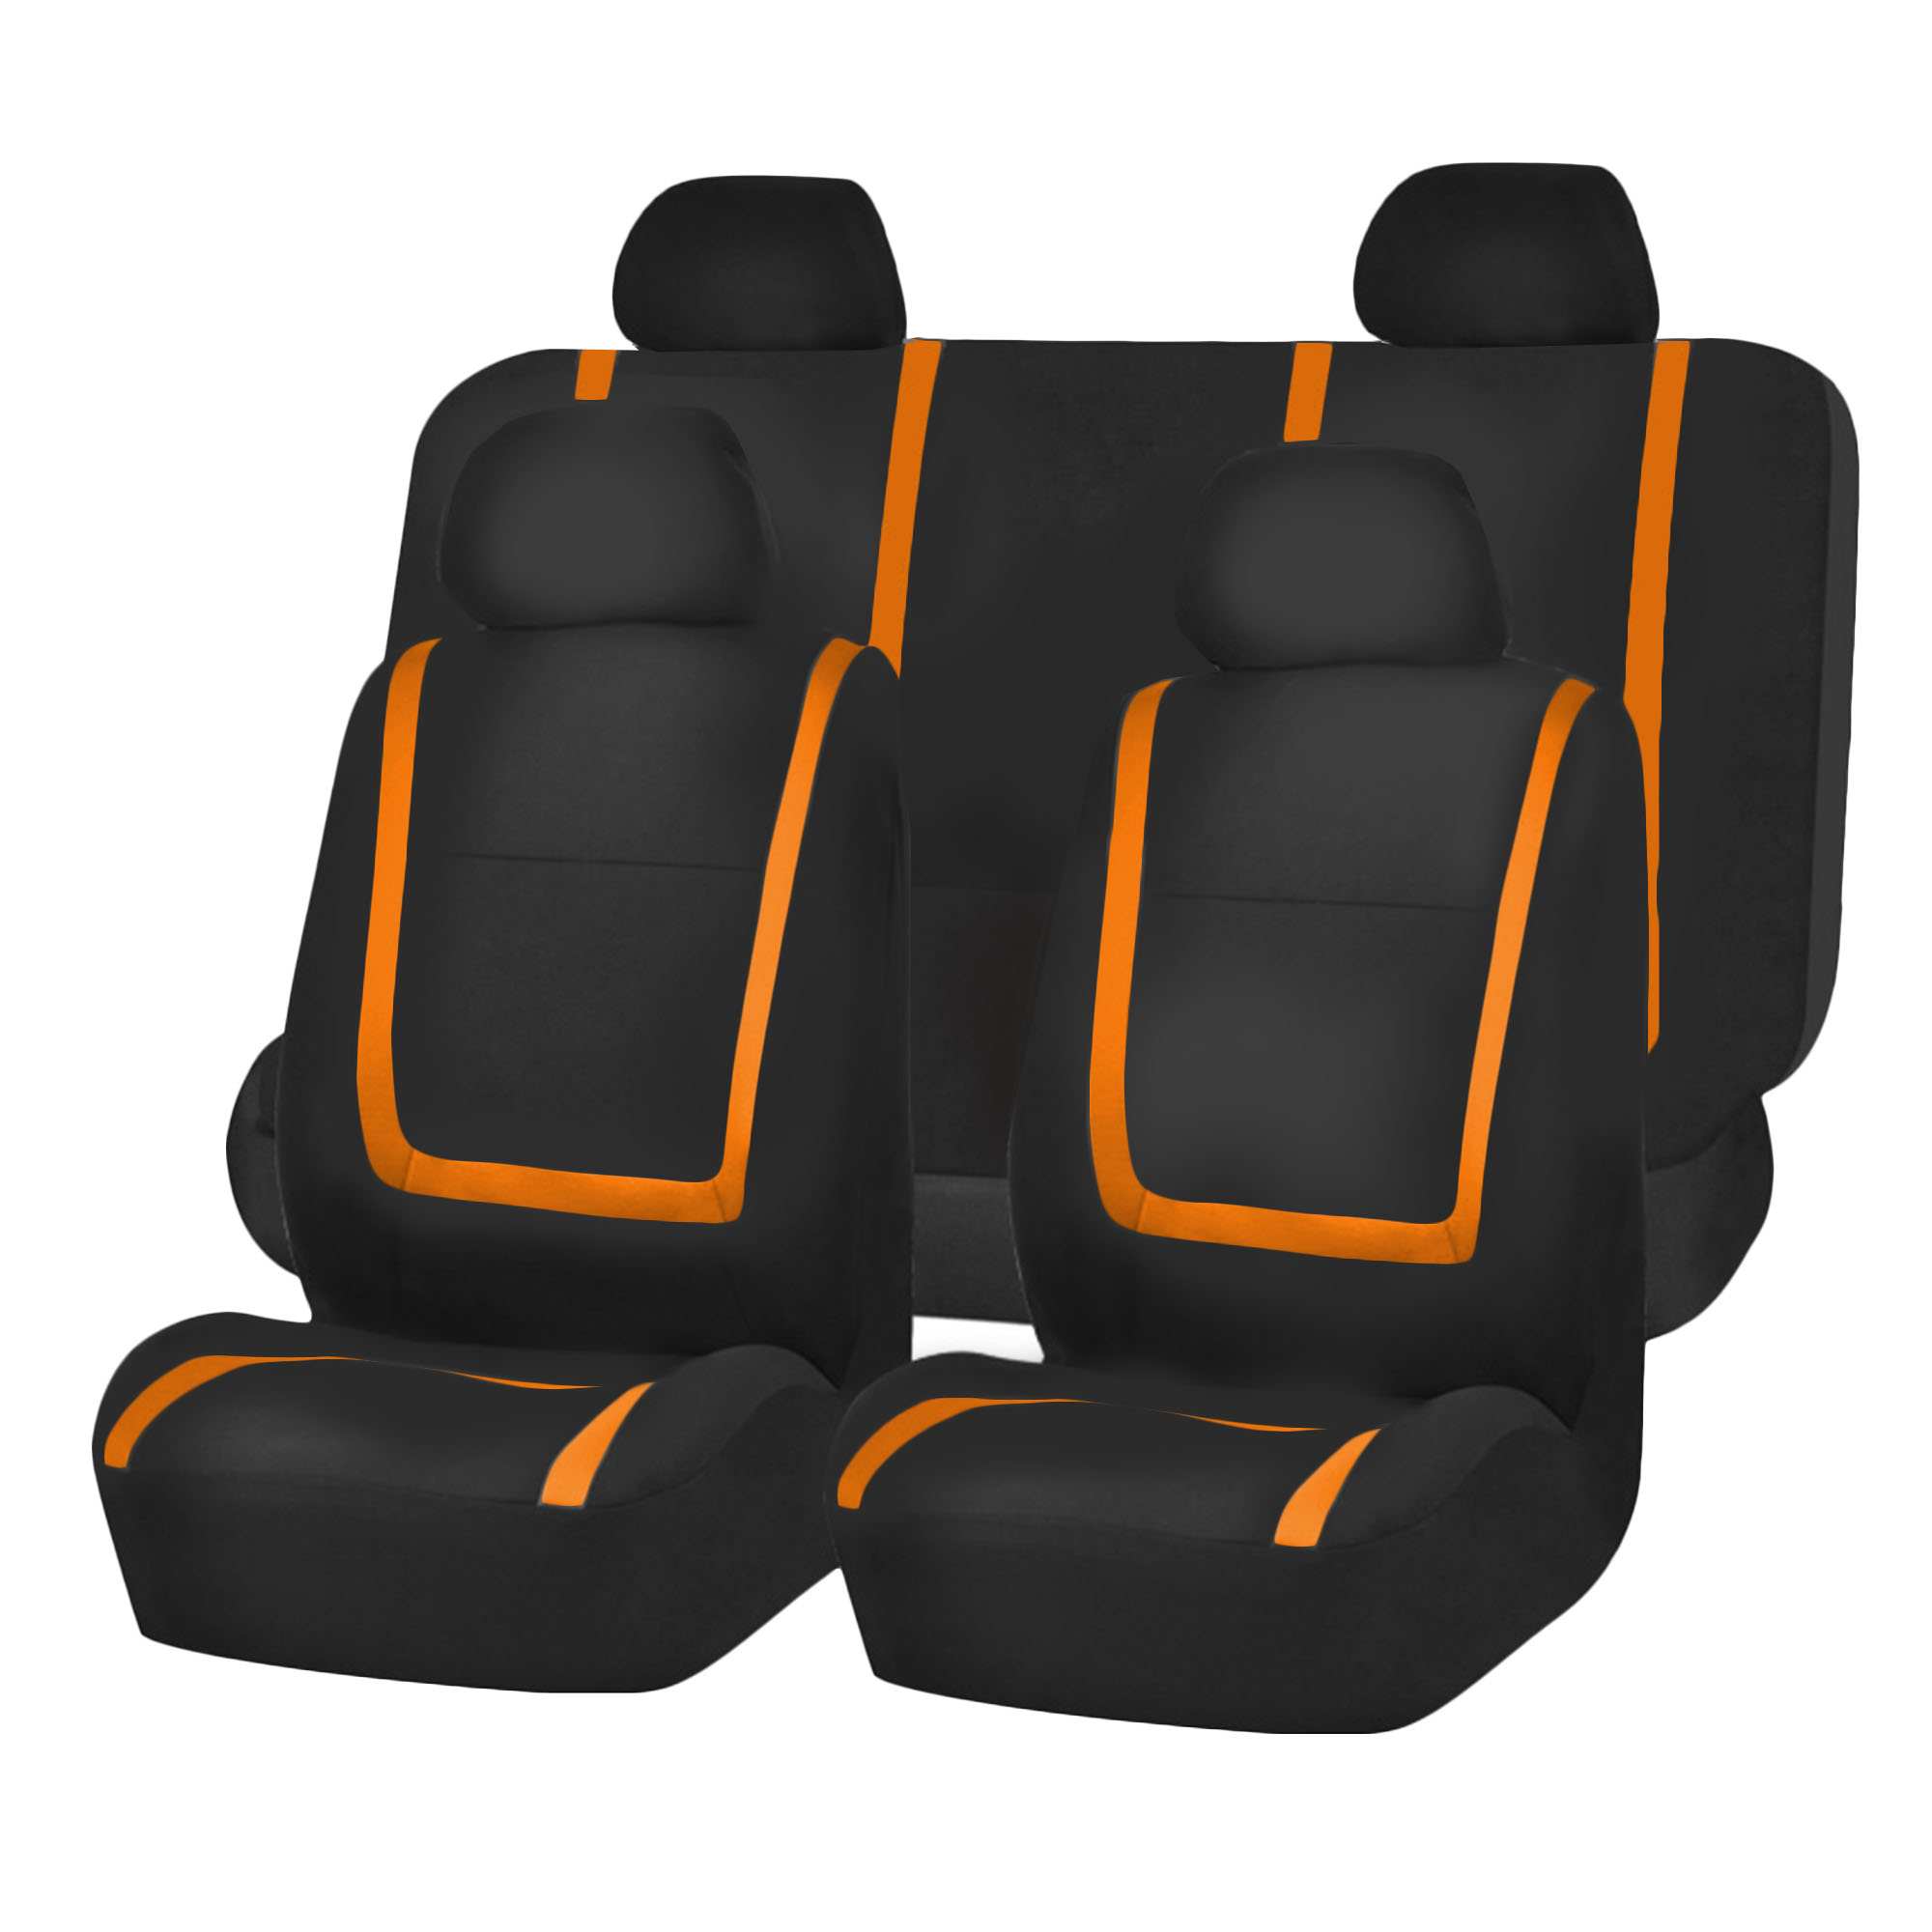 Auto Seat Covers for Car Sedan Truck Van Universal Seat Covers 12 Colors Orange